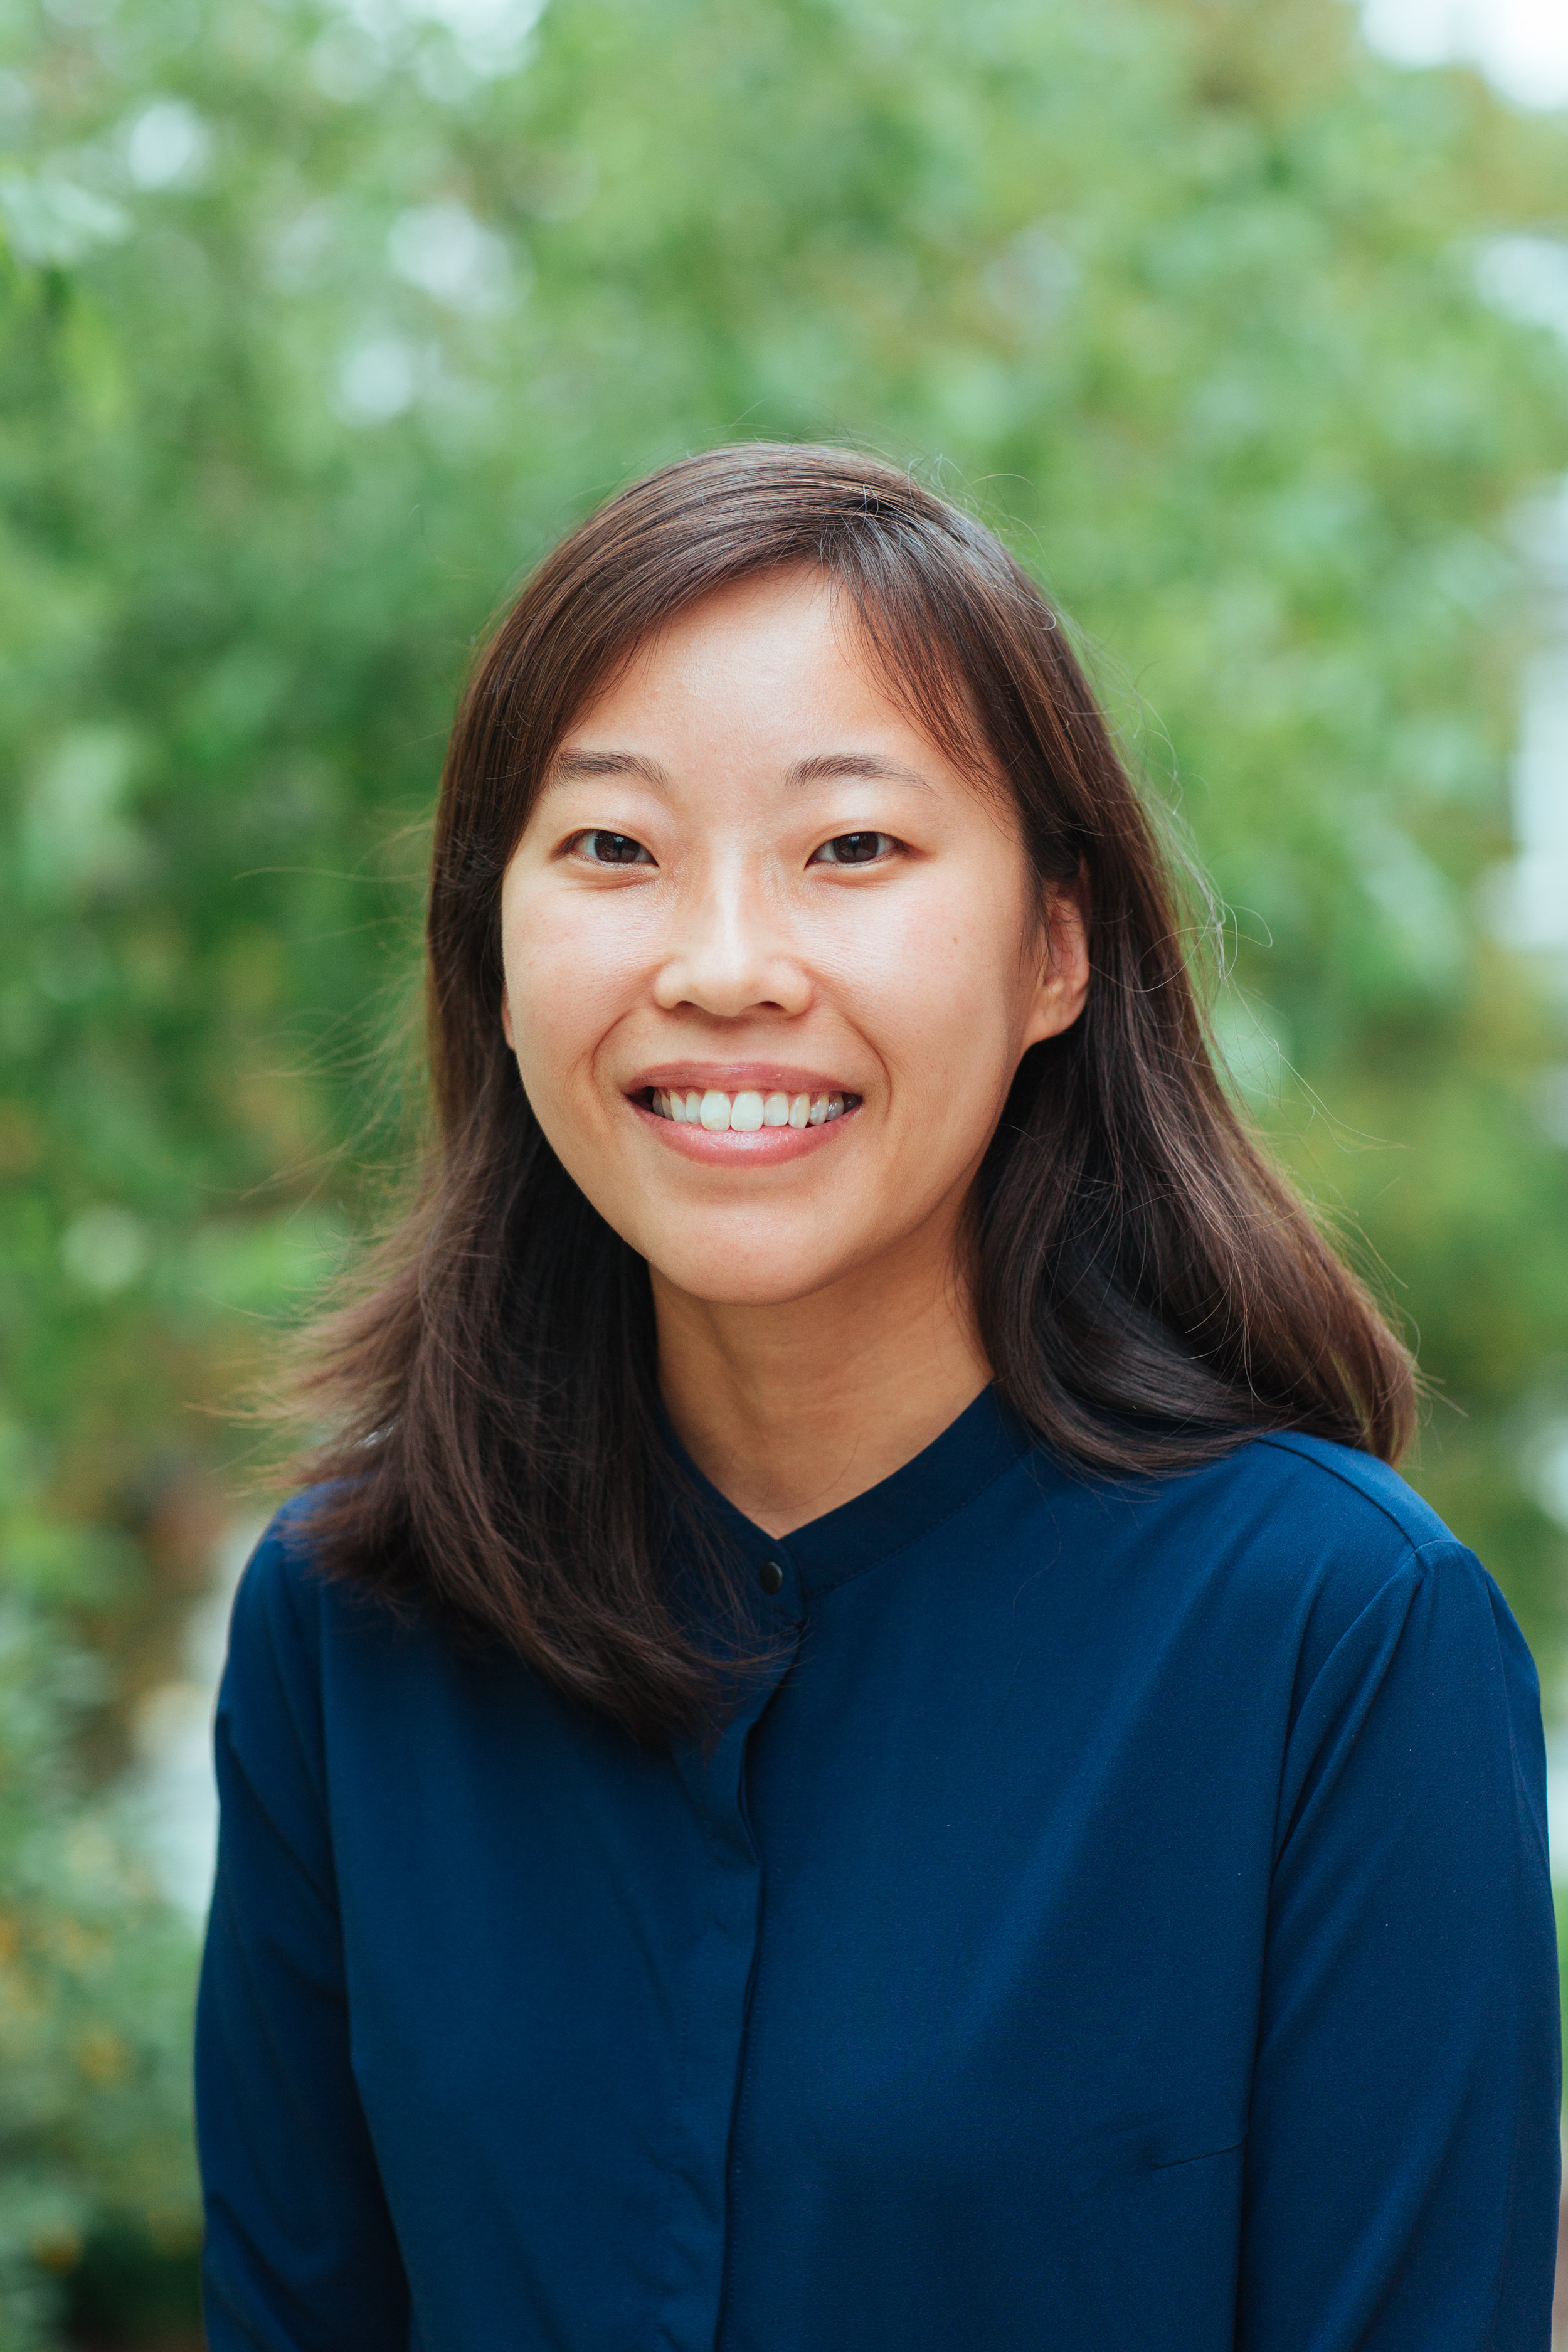 Abby Burkland   Development Coordinator, Union of Concerned Scientists